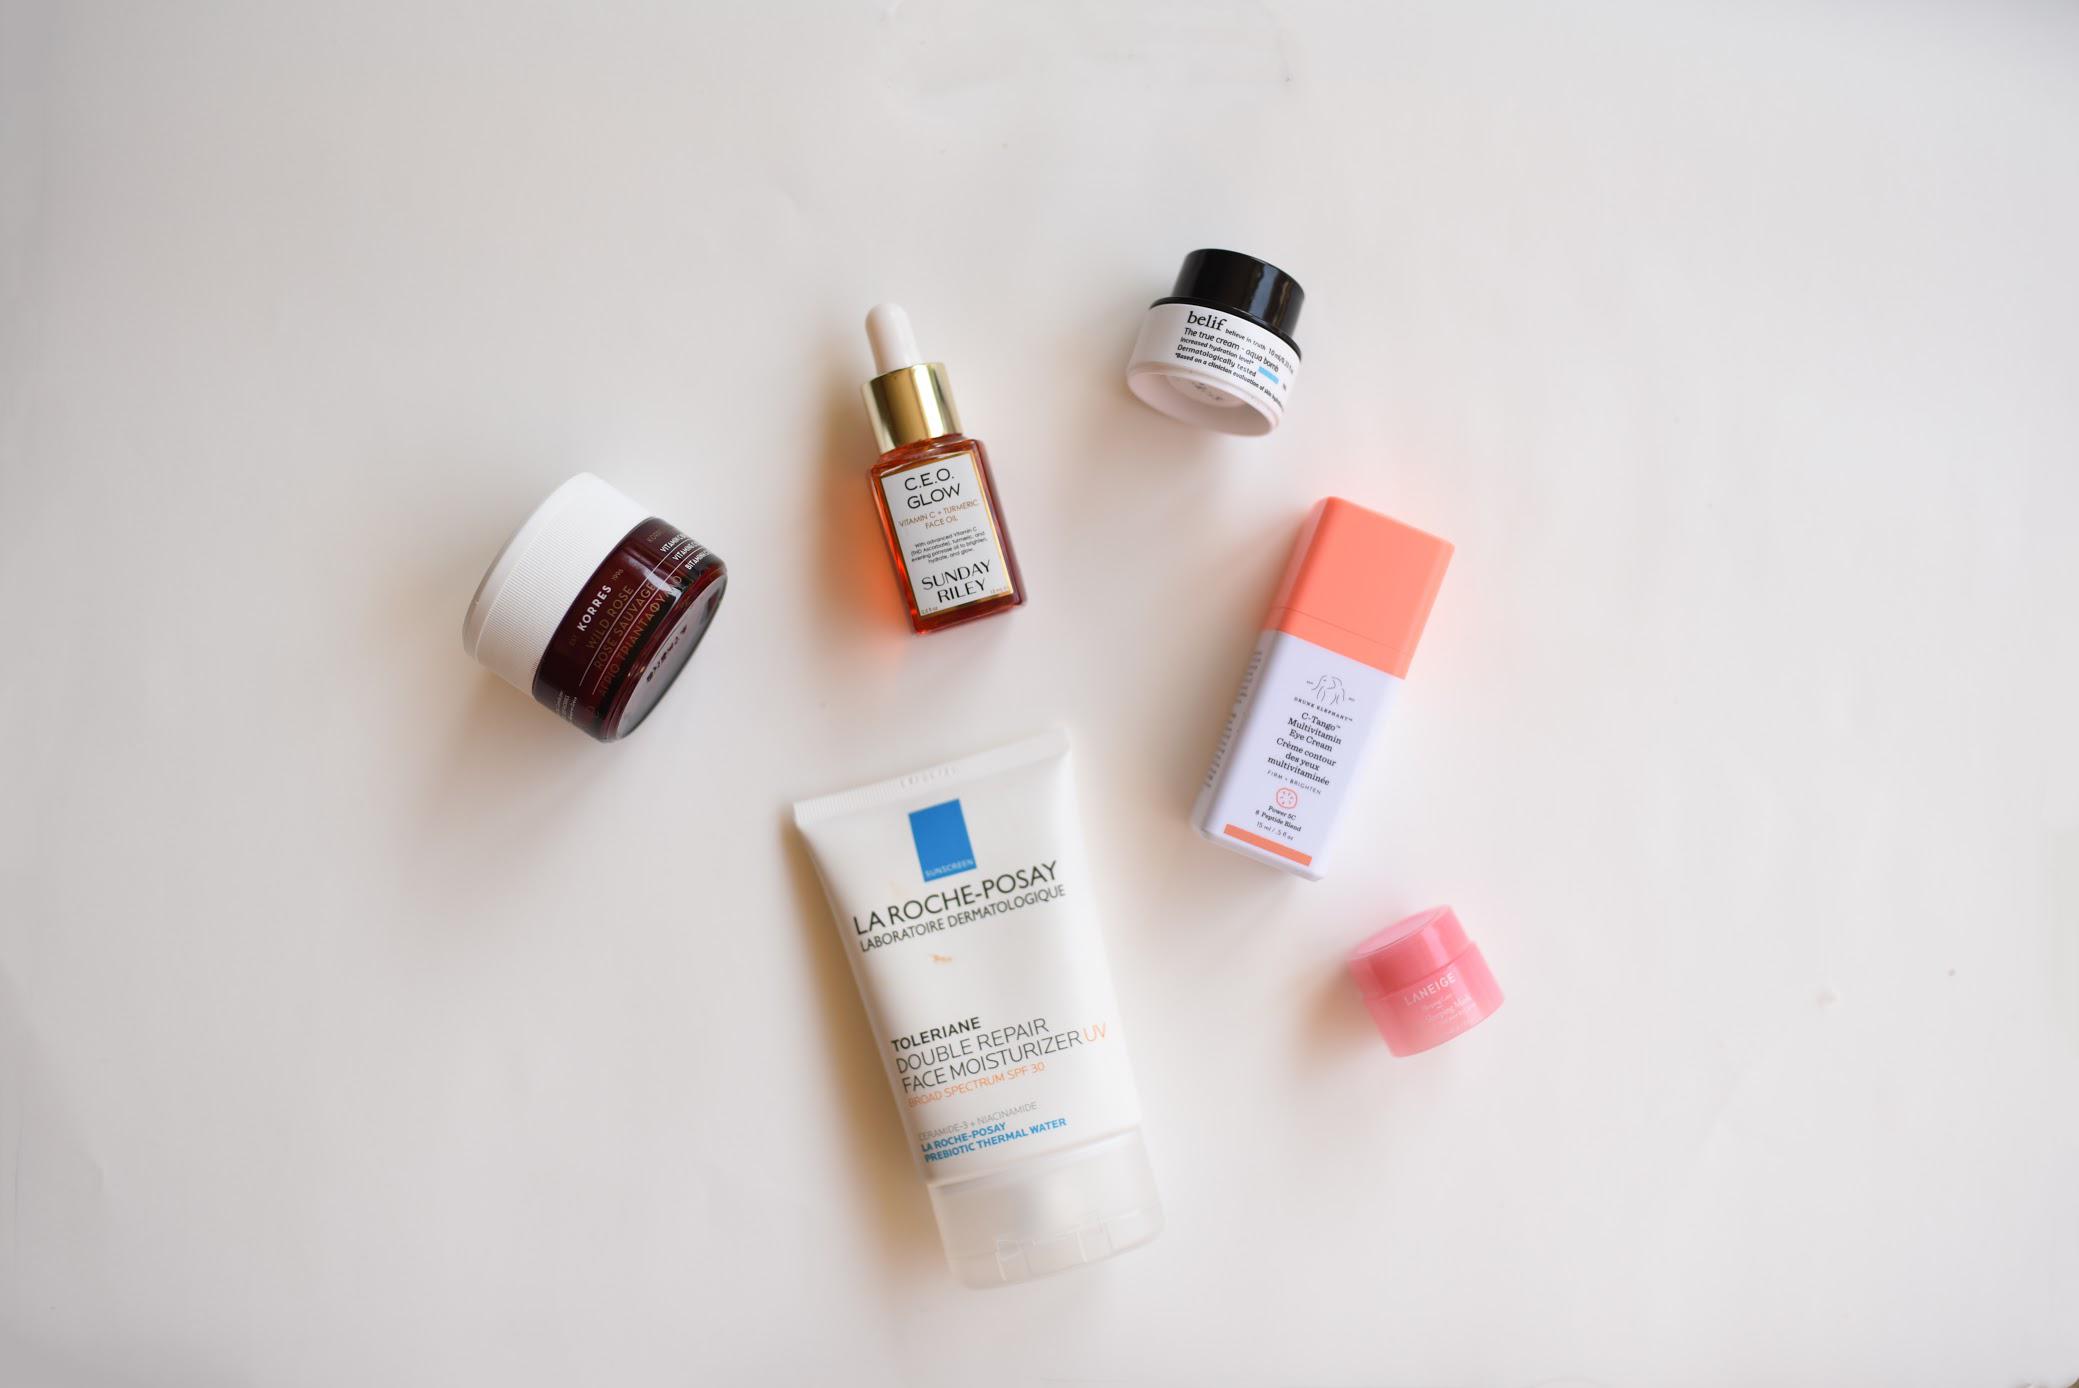 simple skincare routine blog post 2019